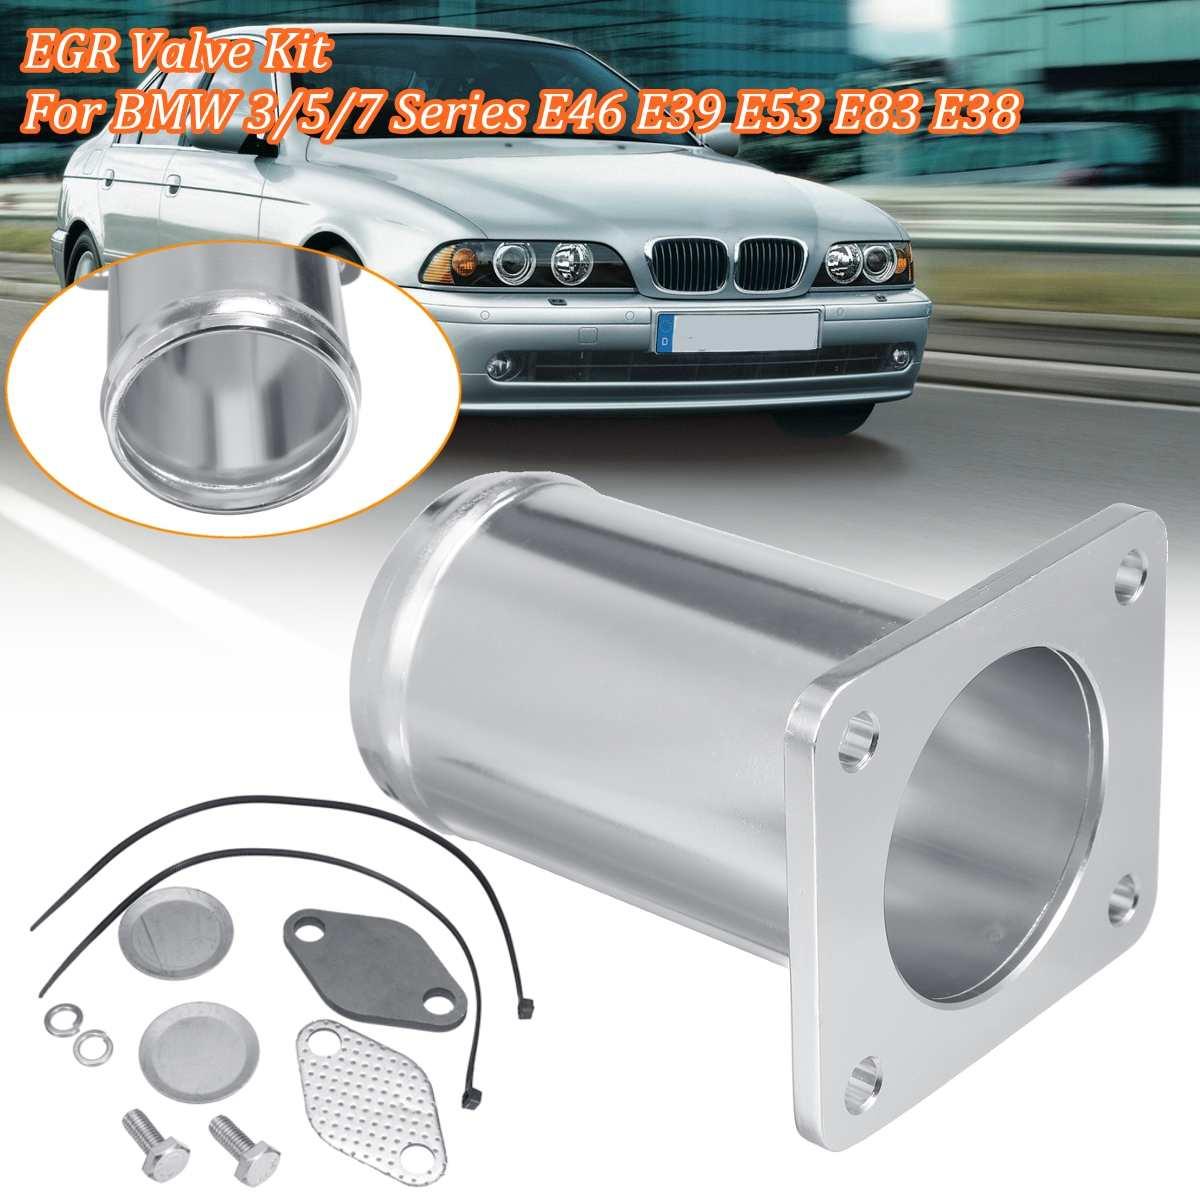 Car 1Set Stainless Steel Egr Removal Kit Blanking Bypass For BMW 3 5 7 Series E46 E39 E53 E83 E38 318d  Remove Repair Tool Kit